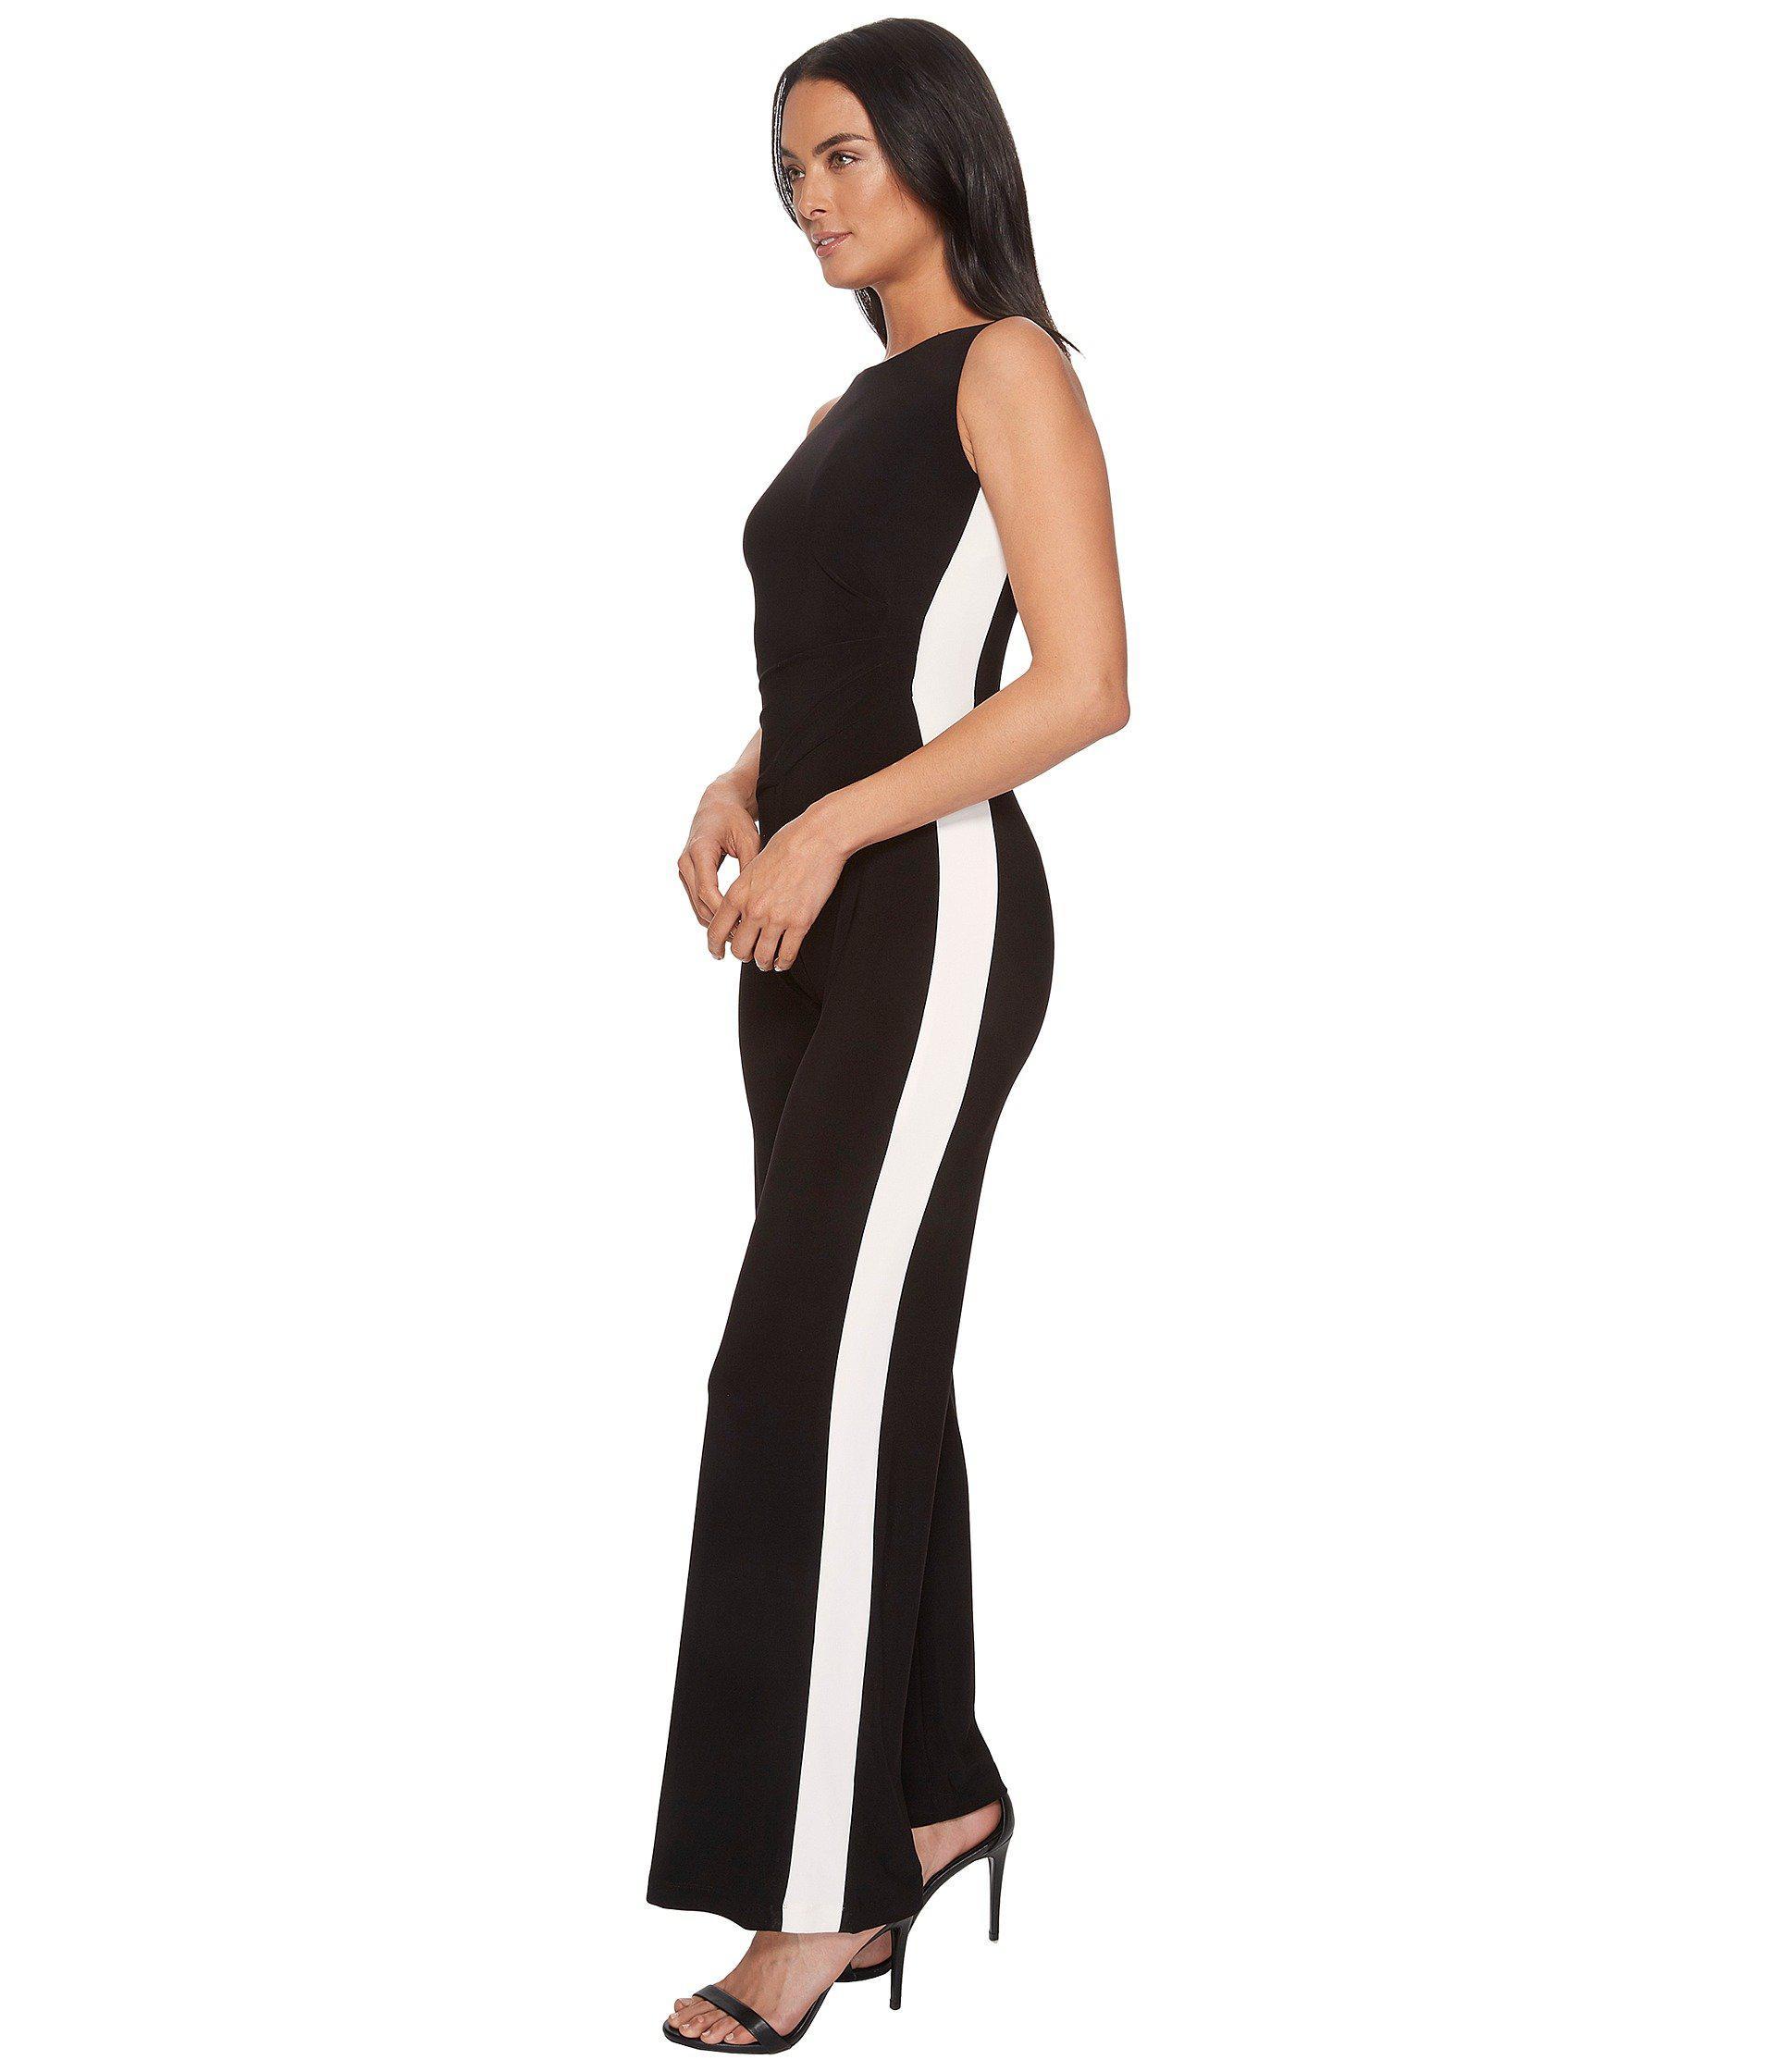 1f129702a40 Lyst - Lauren by Ralph Lauren Shah Two-tone Matte Jersey Jumpsuit in Black  - Save 37%